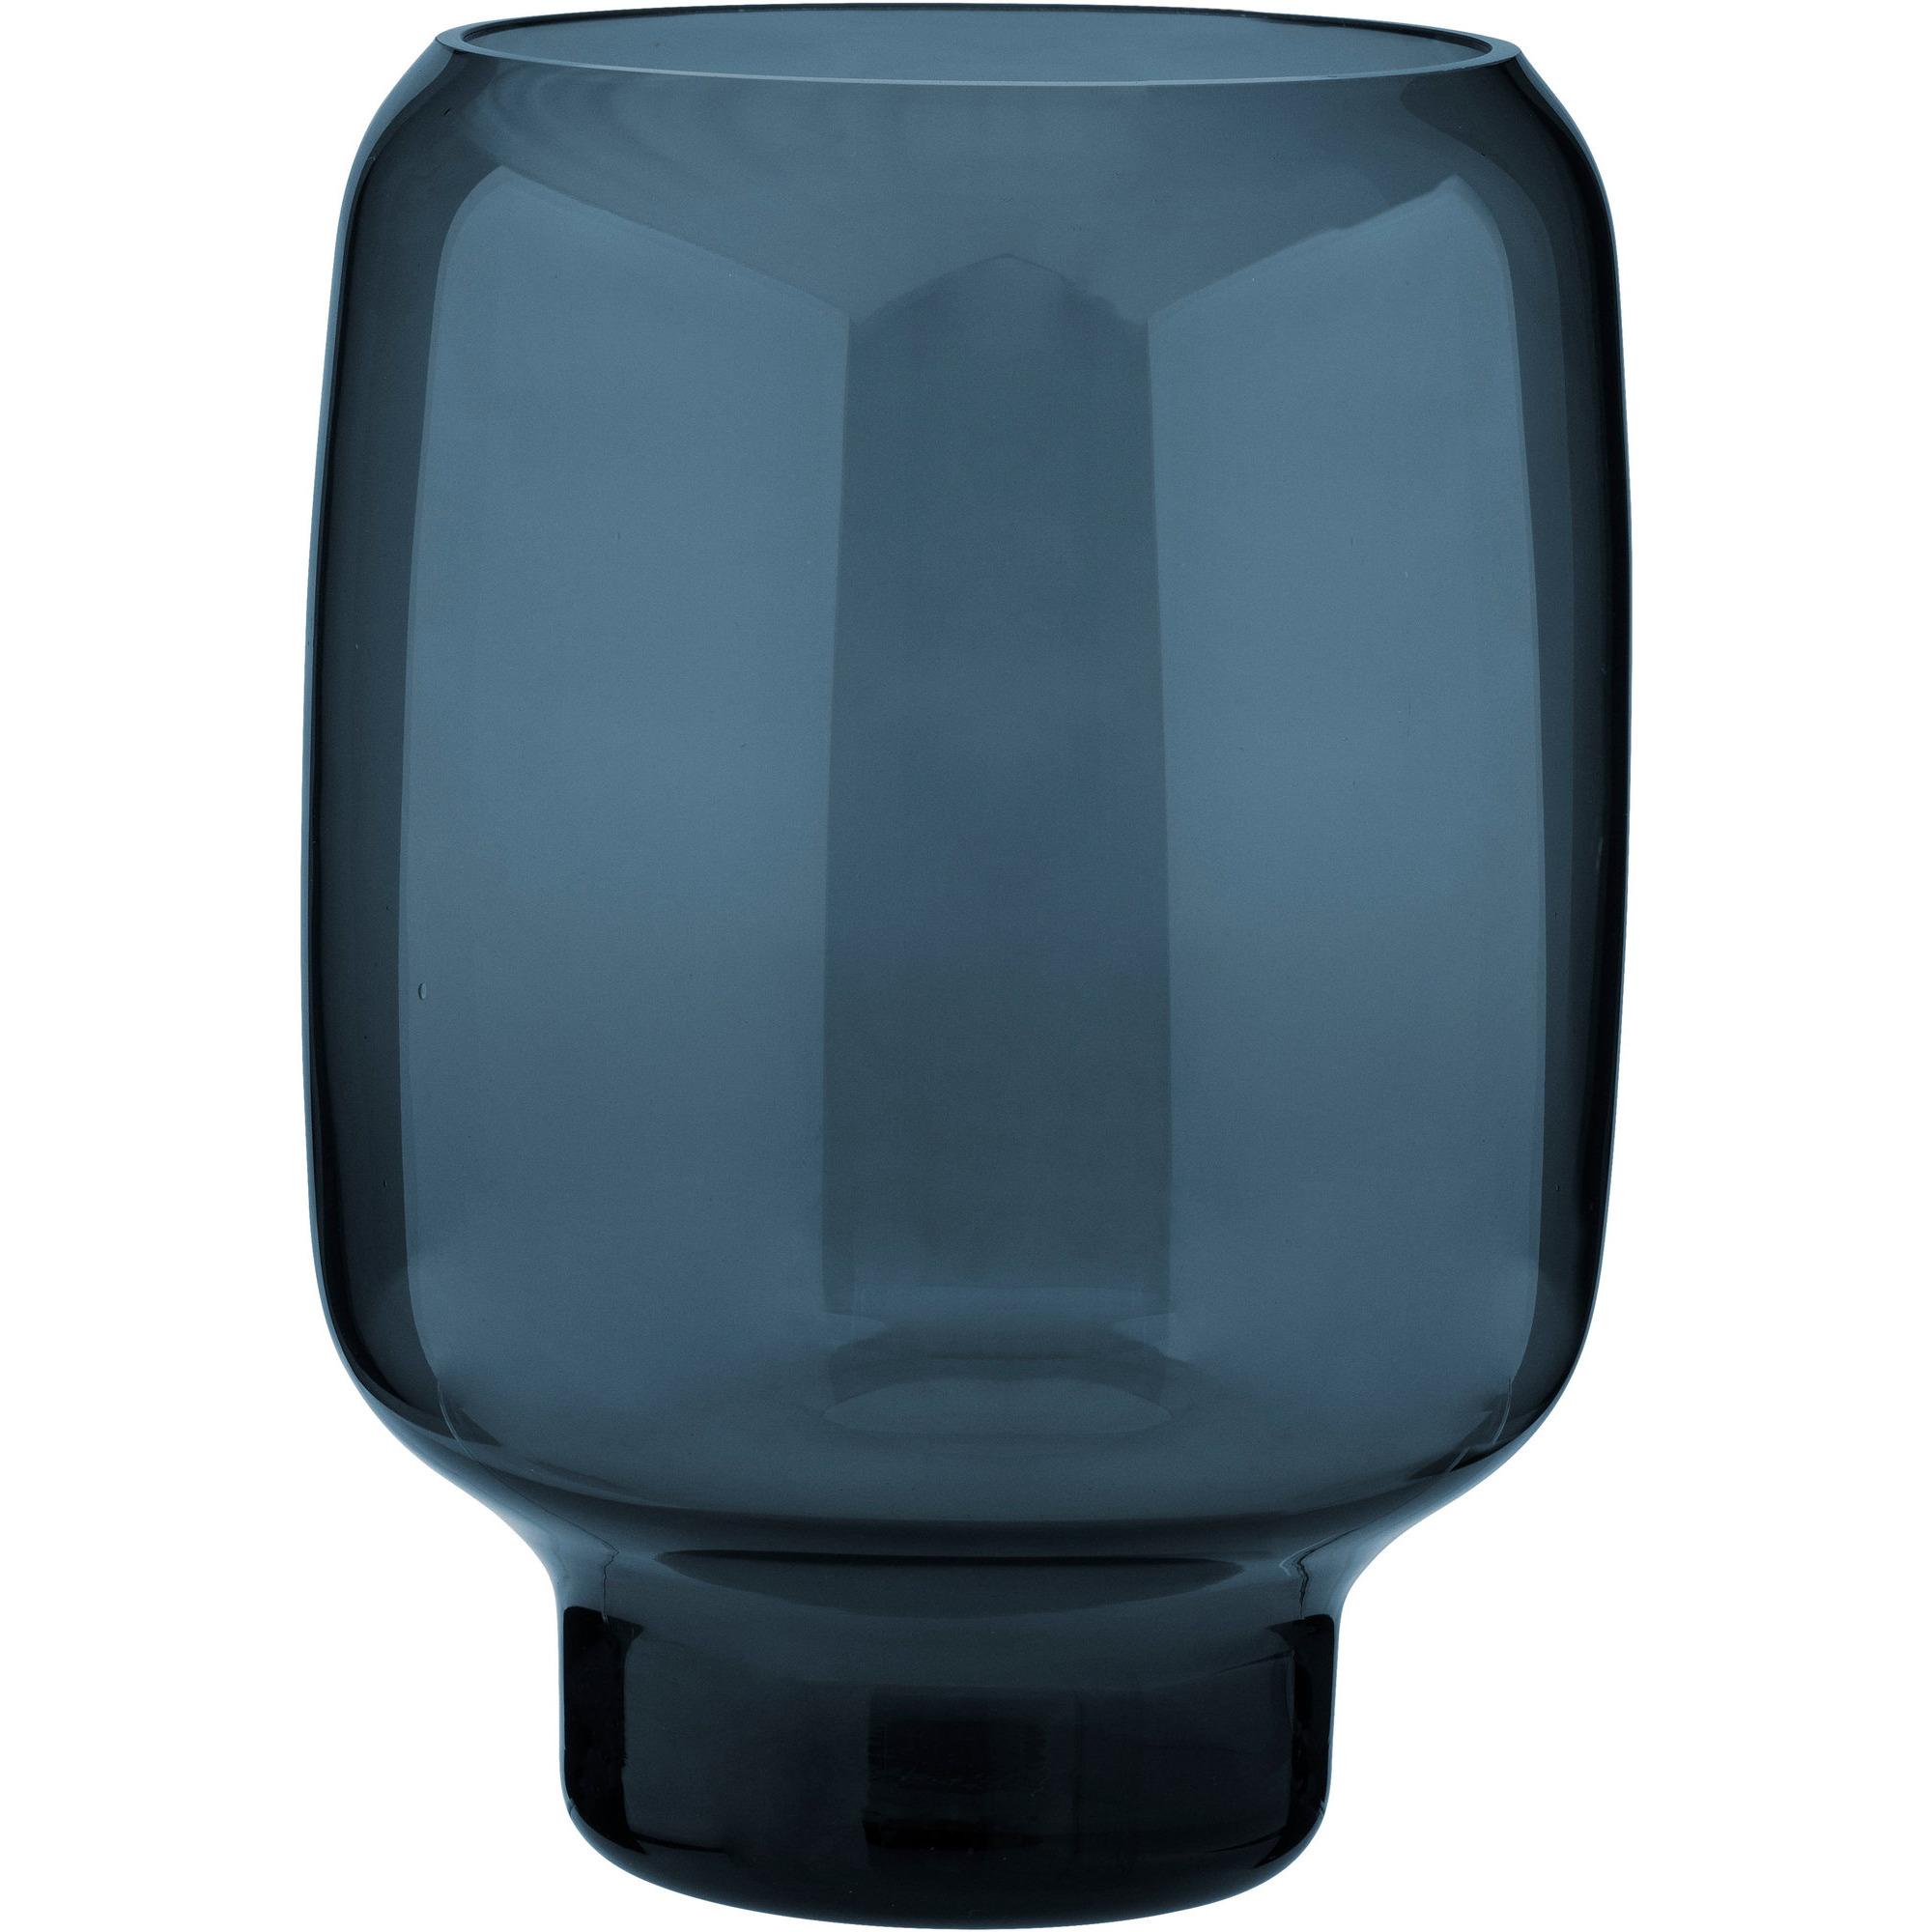 Stelton Hoop Vas 20 cm Glas Midnattsblå